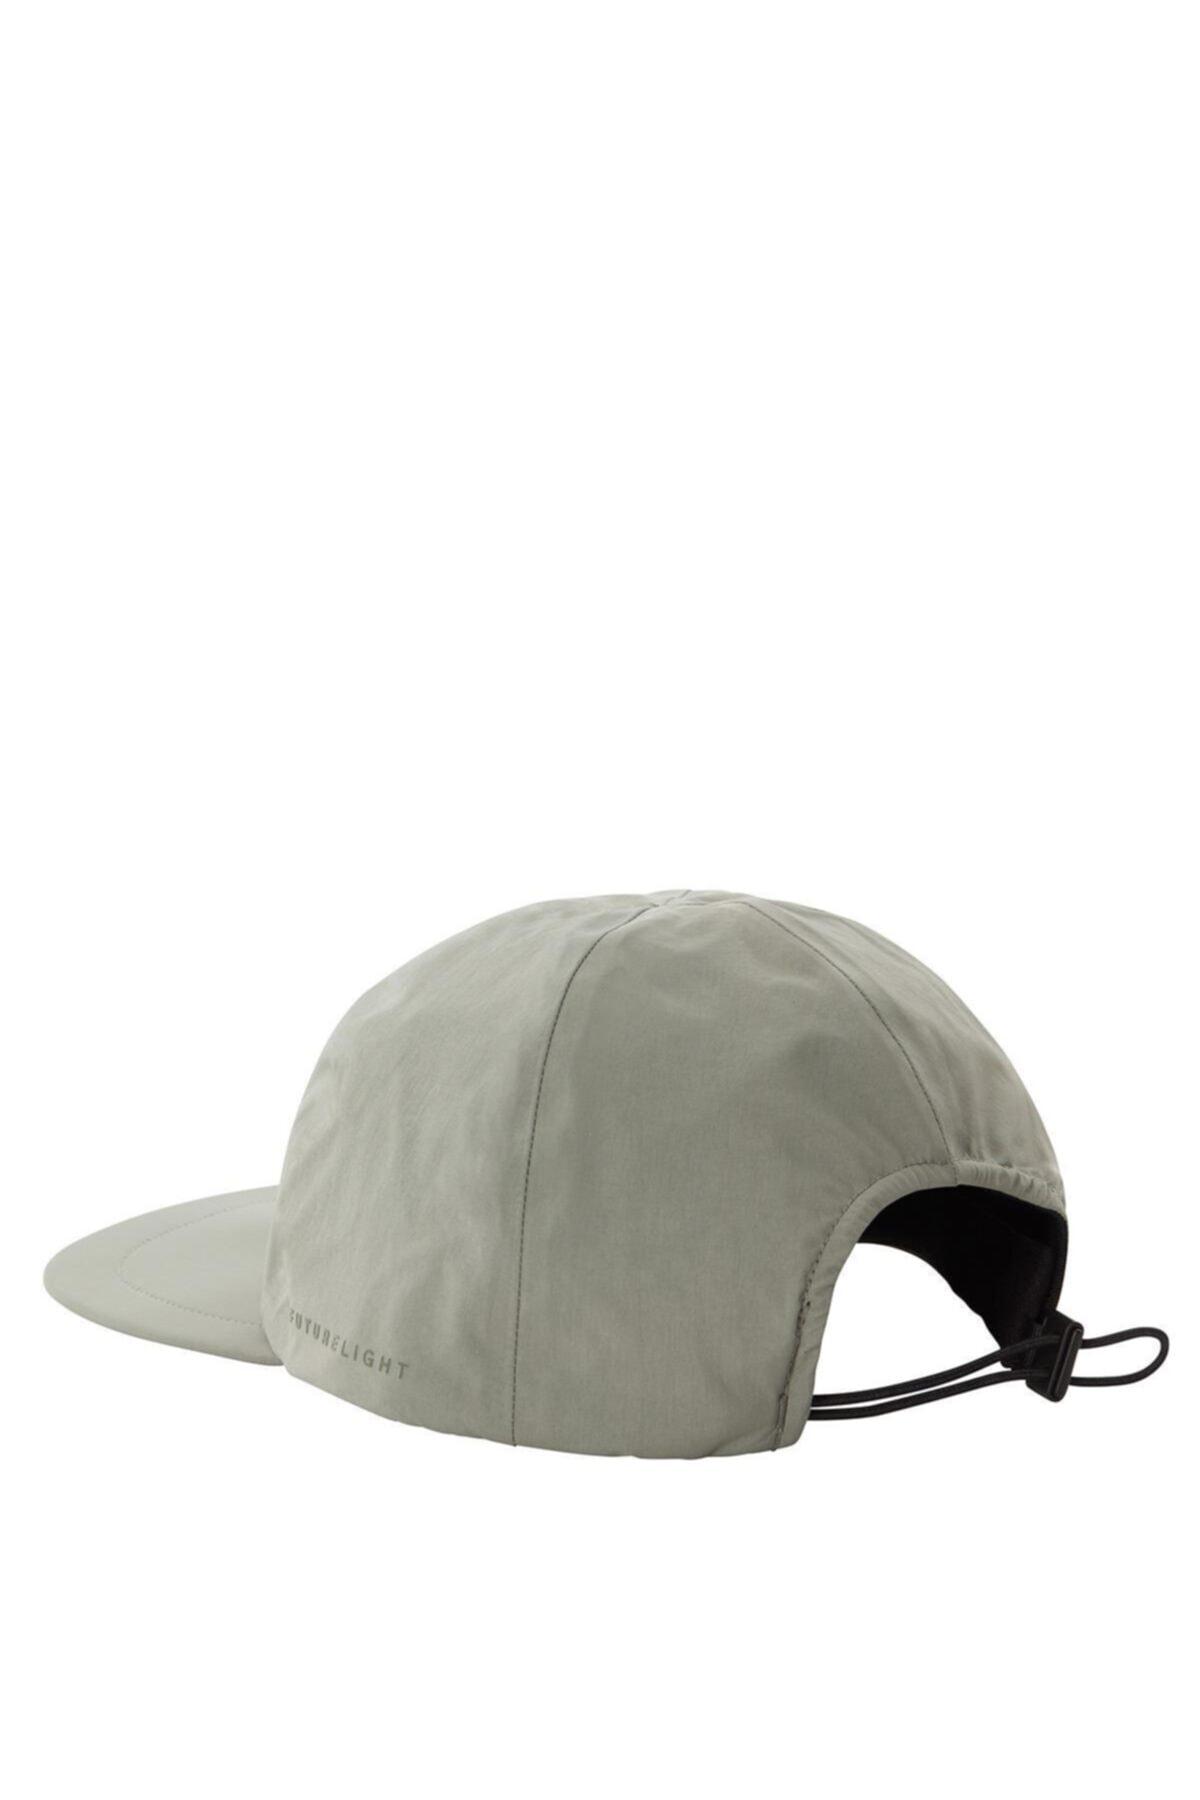 THE NORTH FACE Cıty Crush Futurelıght Şapka Unisex 2